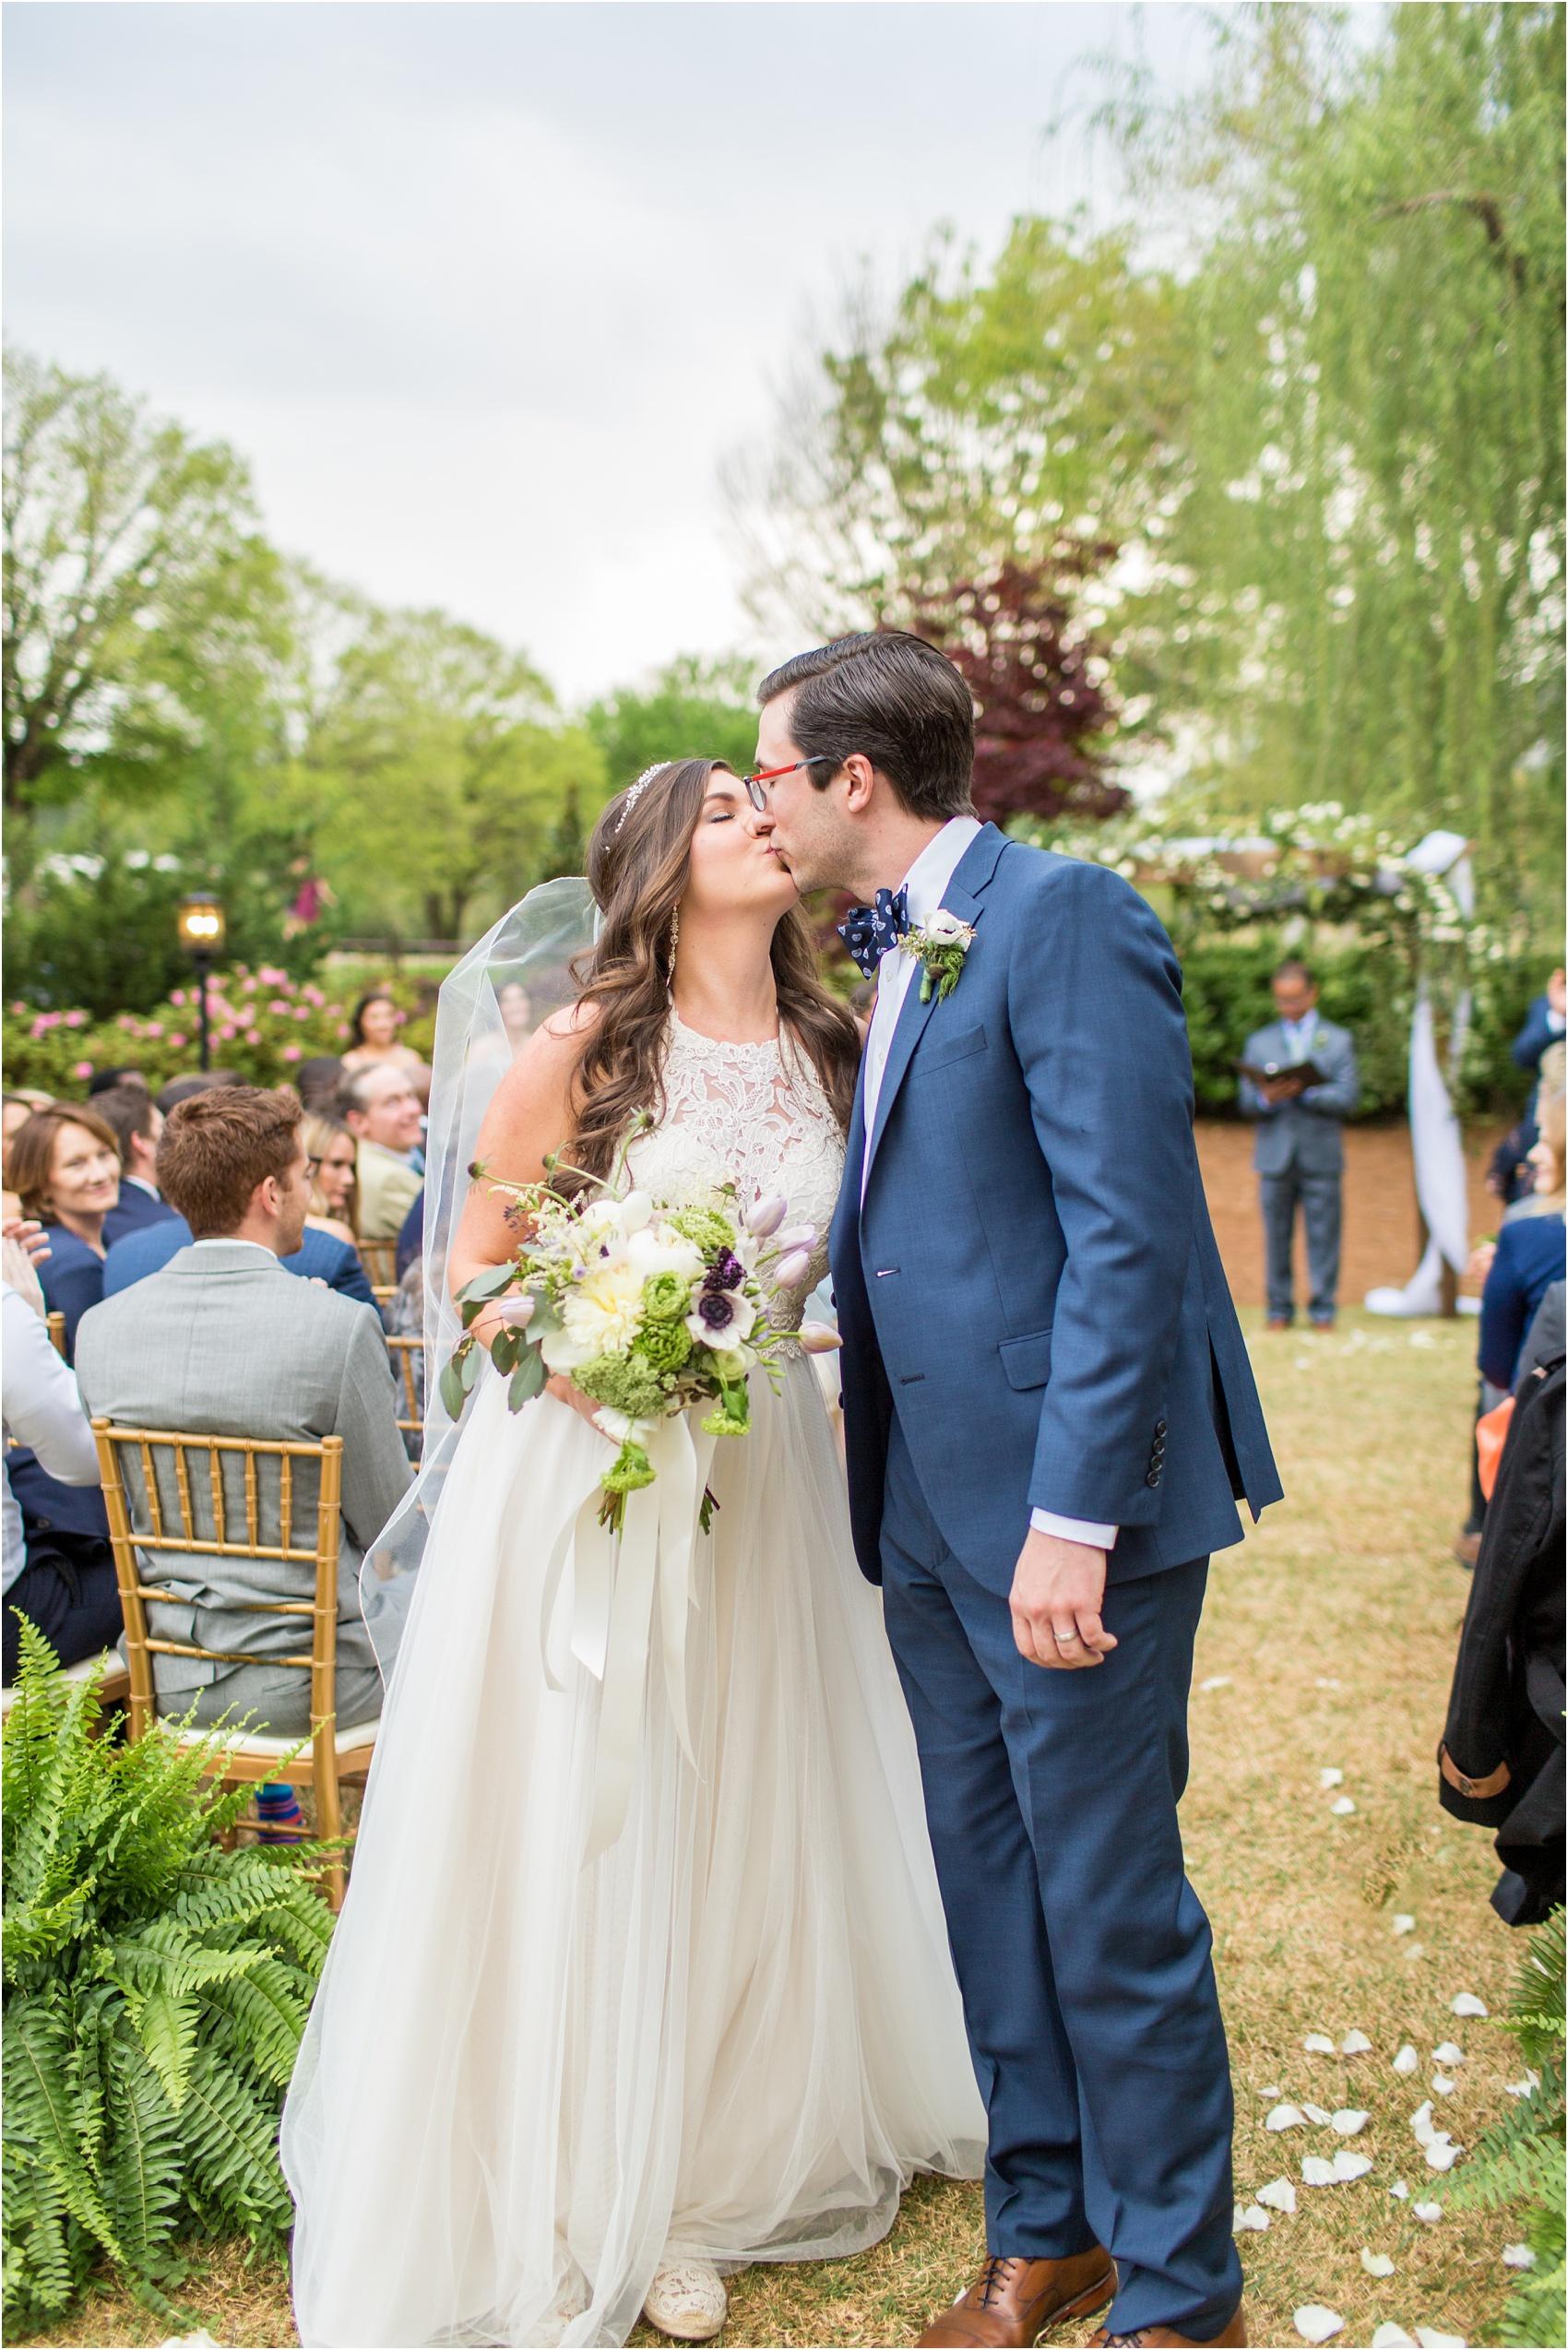 Savannah Eve Photography- Groseclose Wedding- Blog-76.jpg